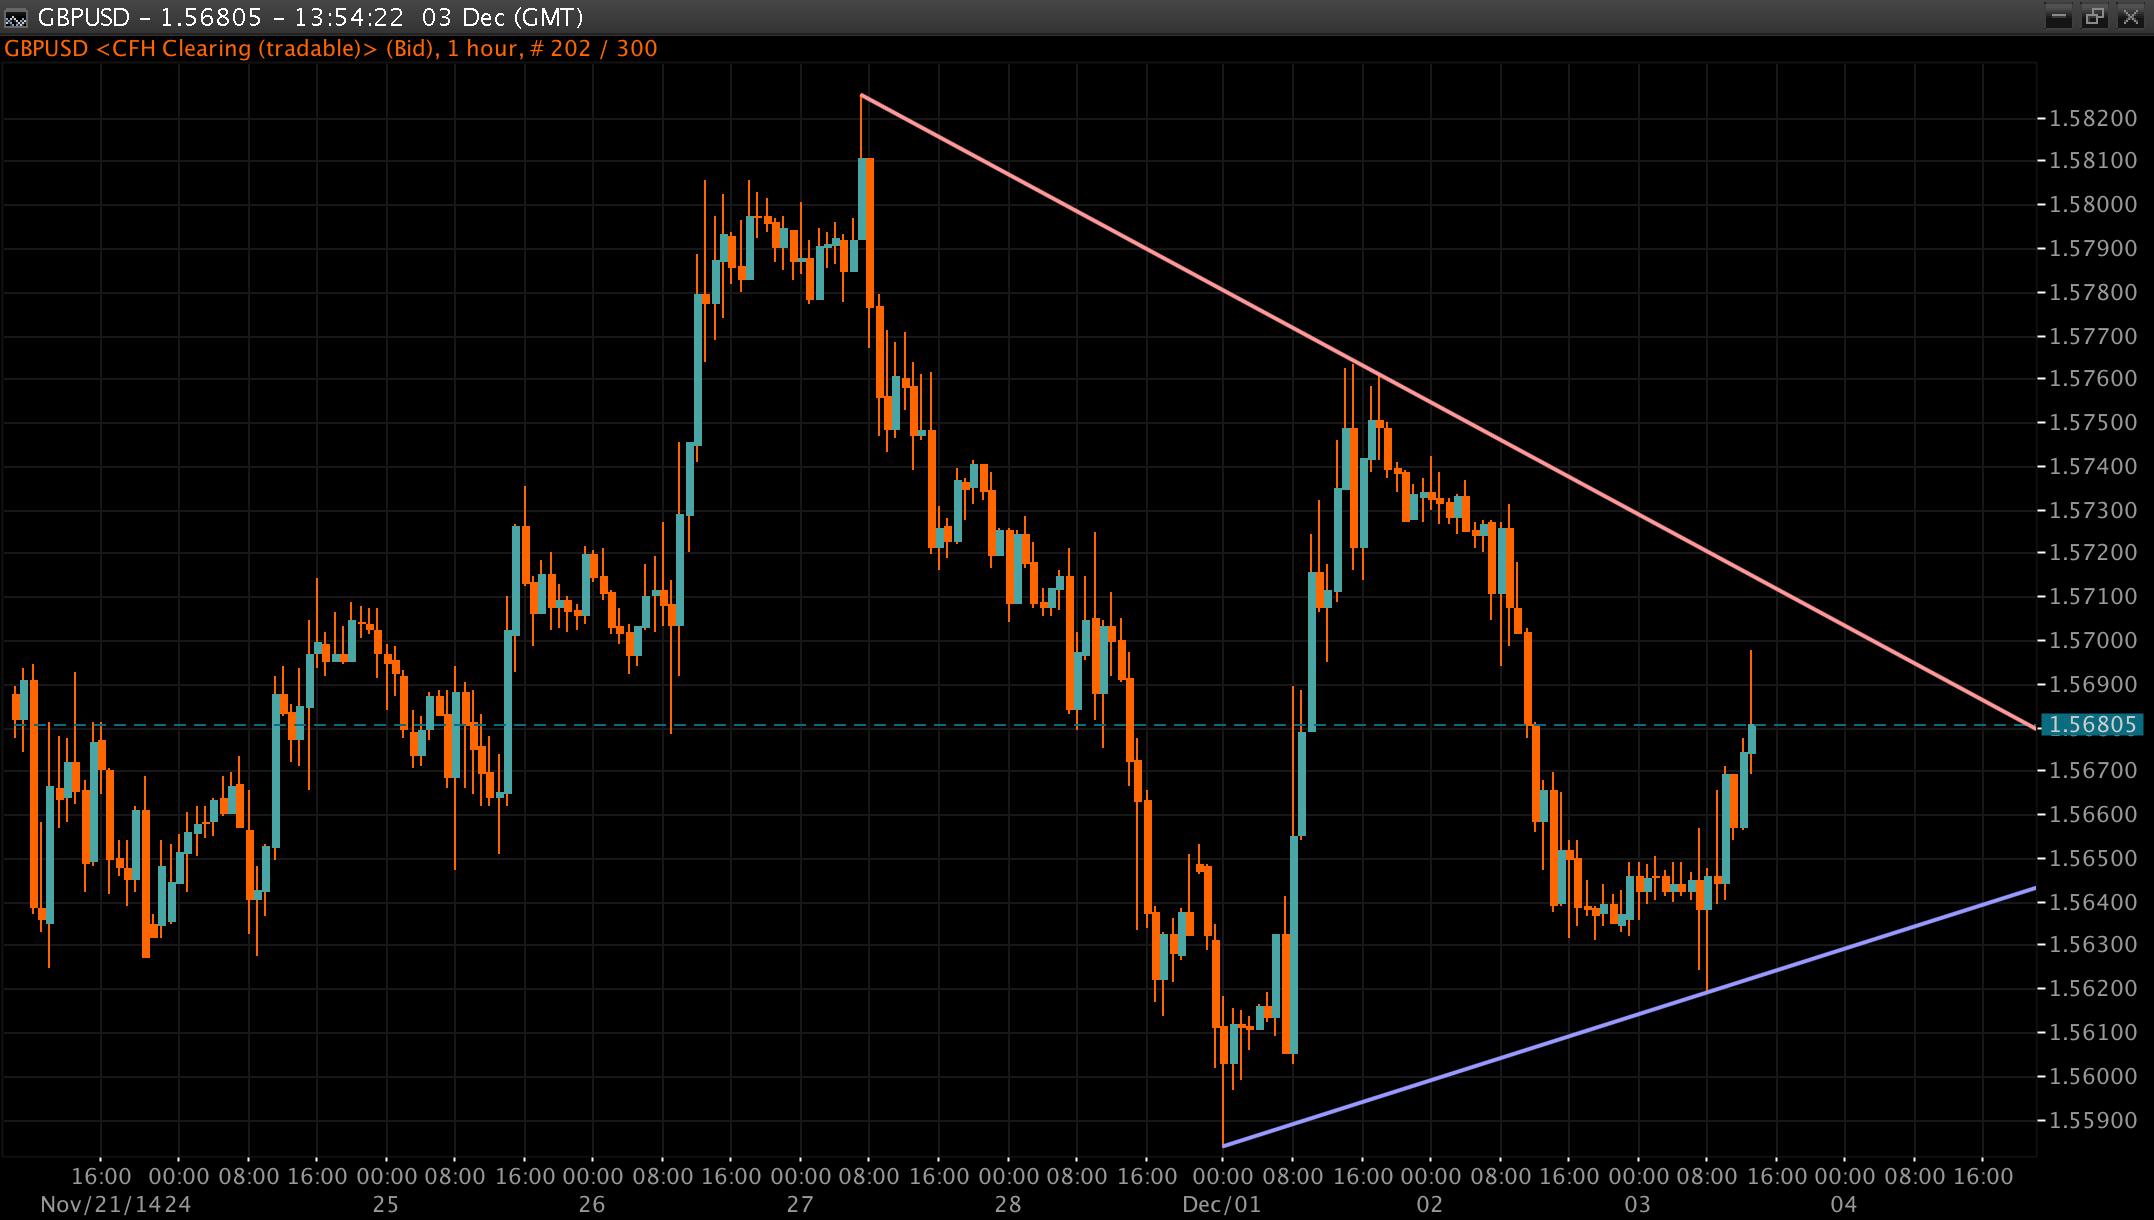 GBP/USD Chart 04 Dec 2014